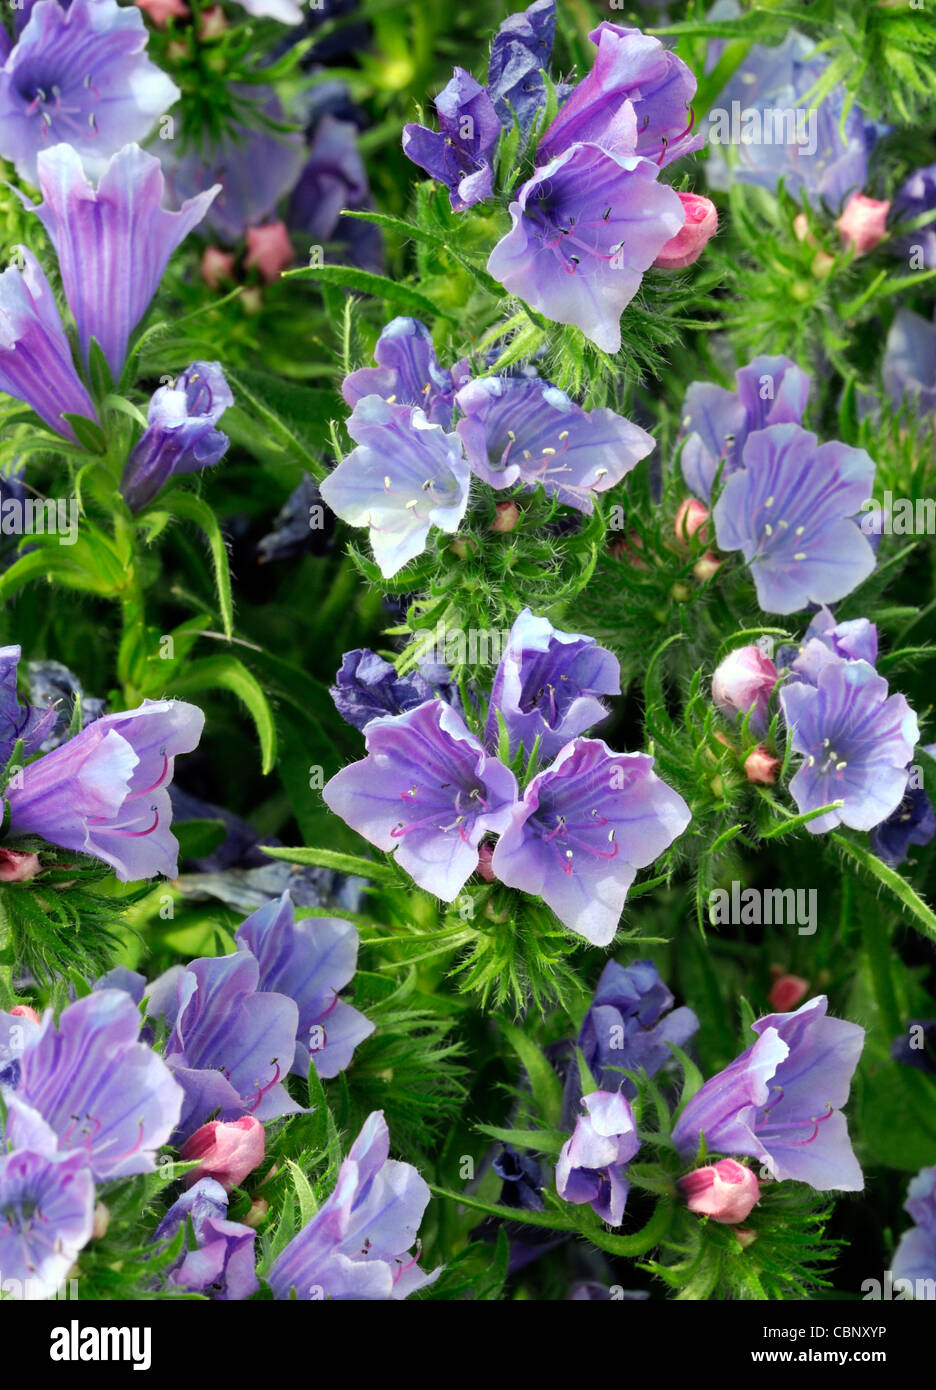 Echium Vulgare Vipers Bugloss Blue Purple Perennials Flowers Bloom